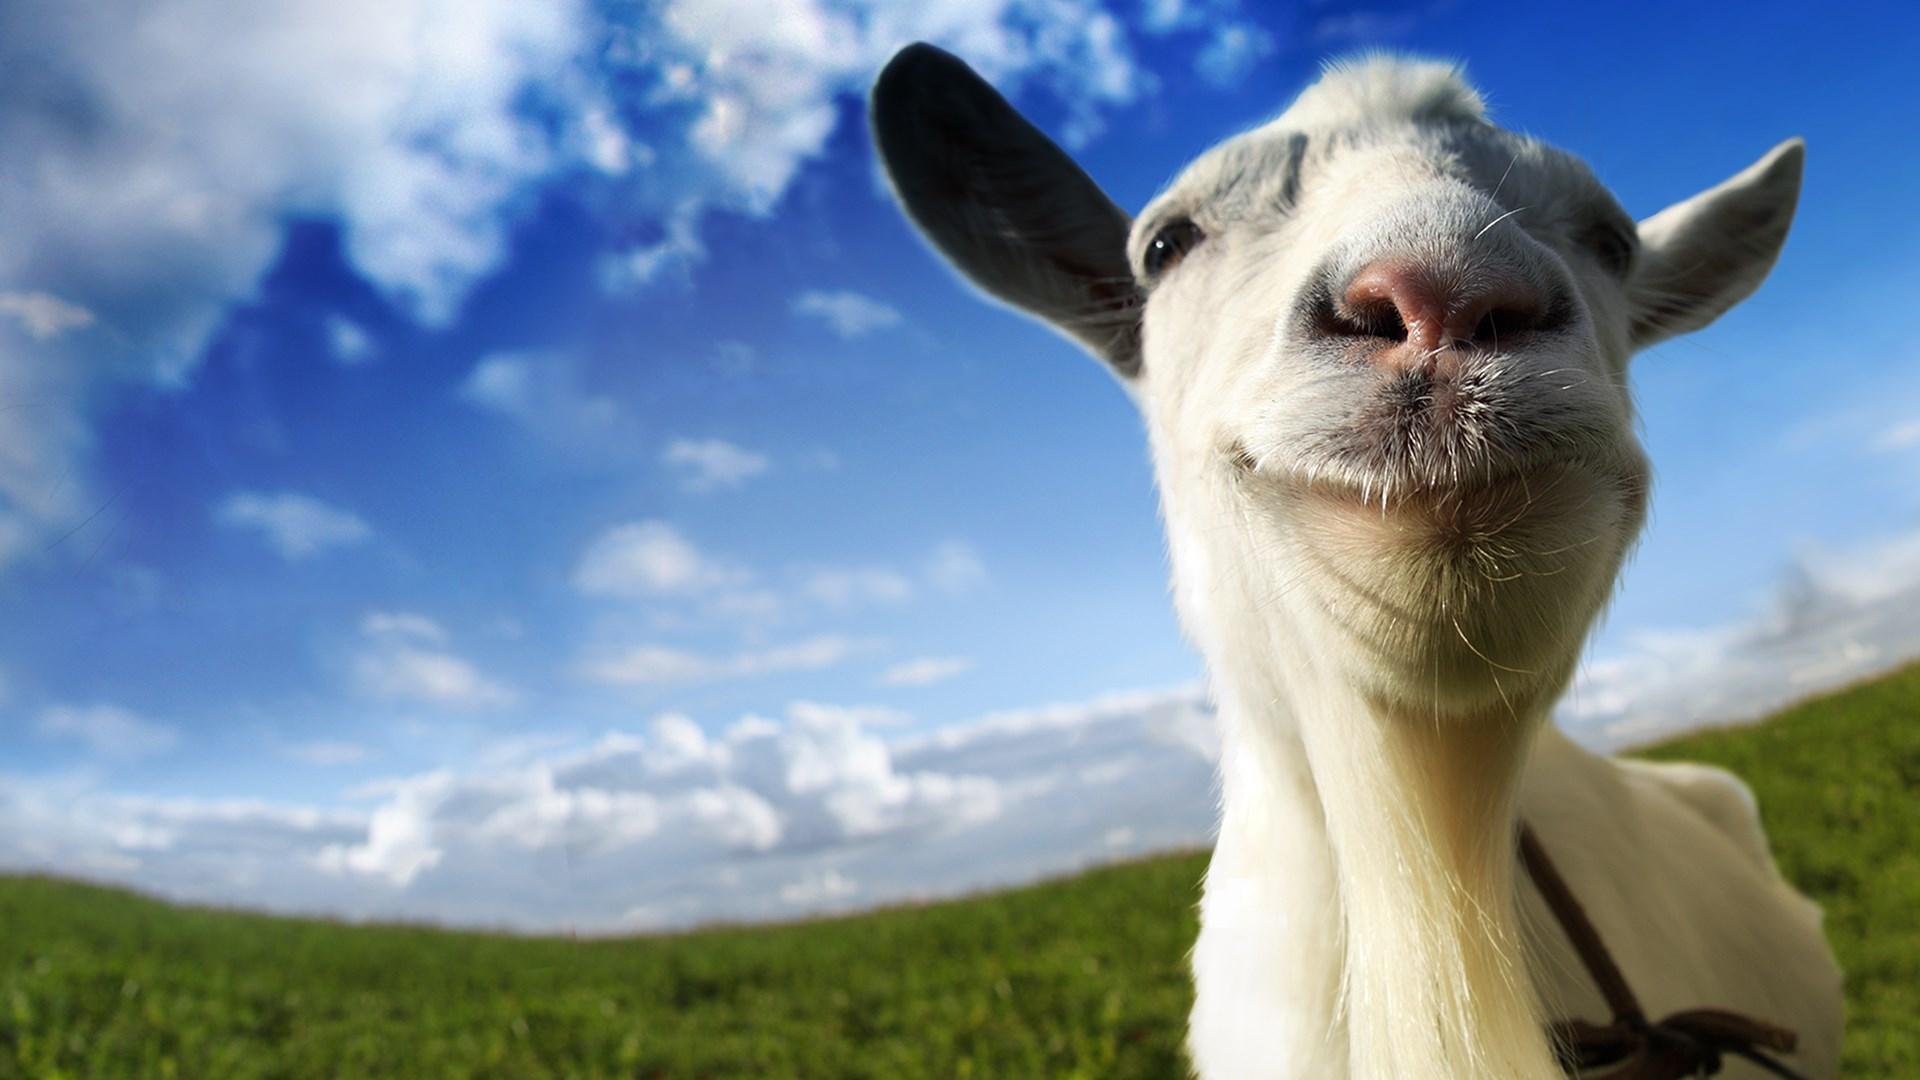 buy goat simulator windows